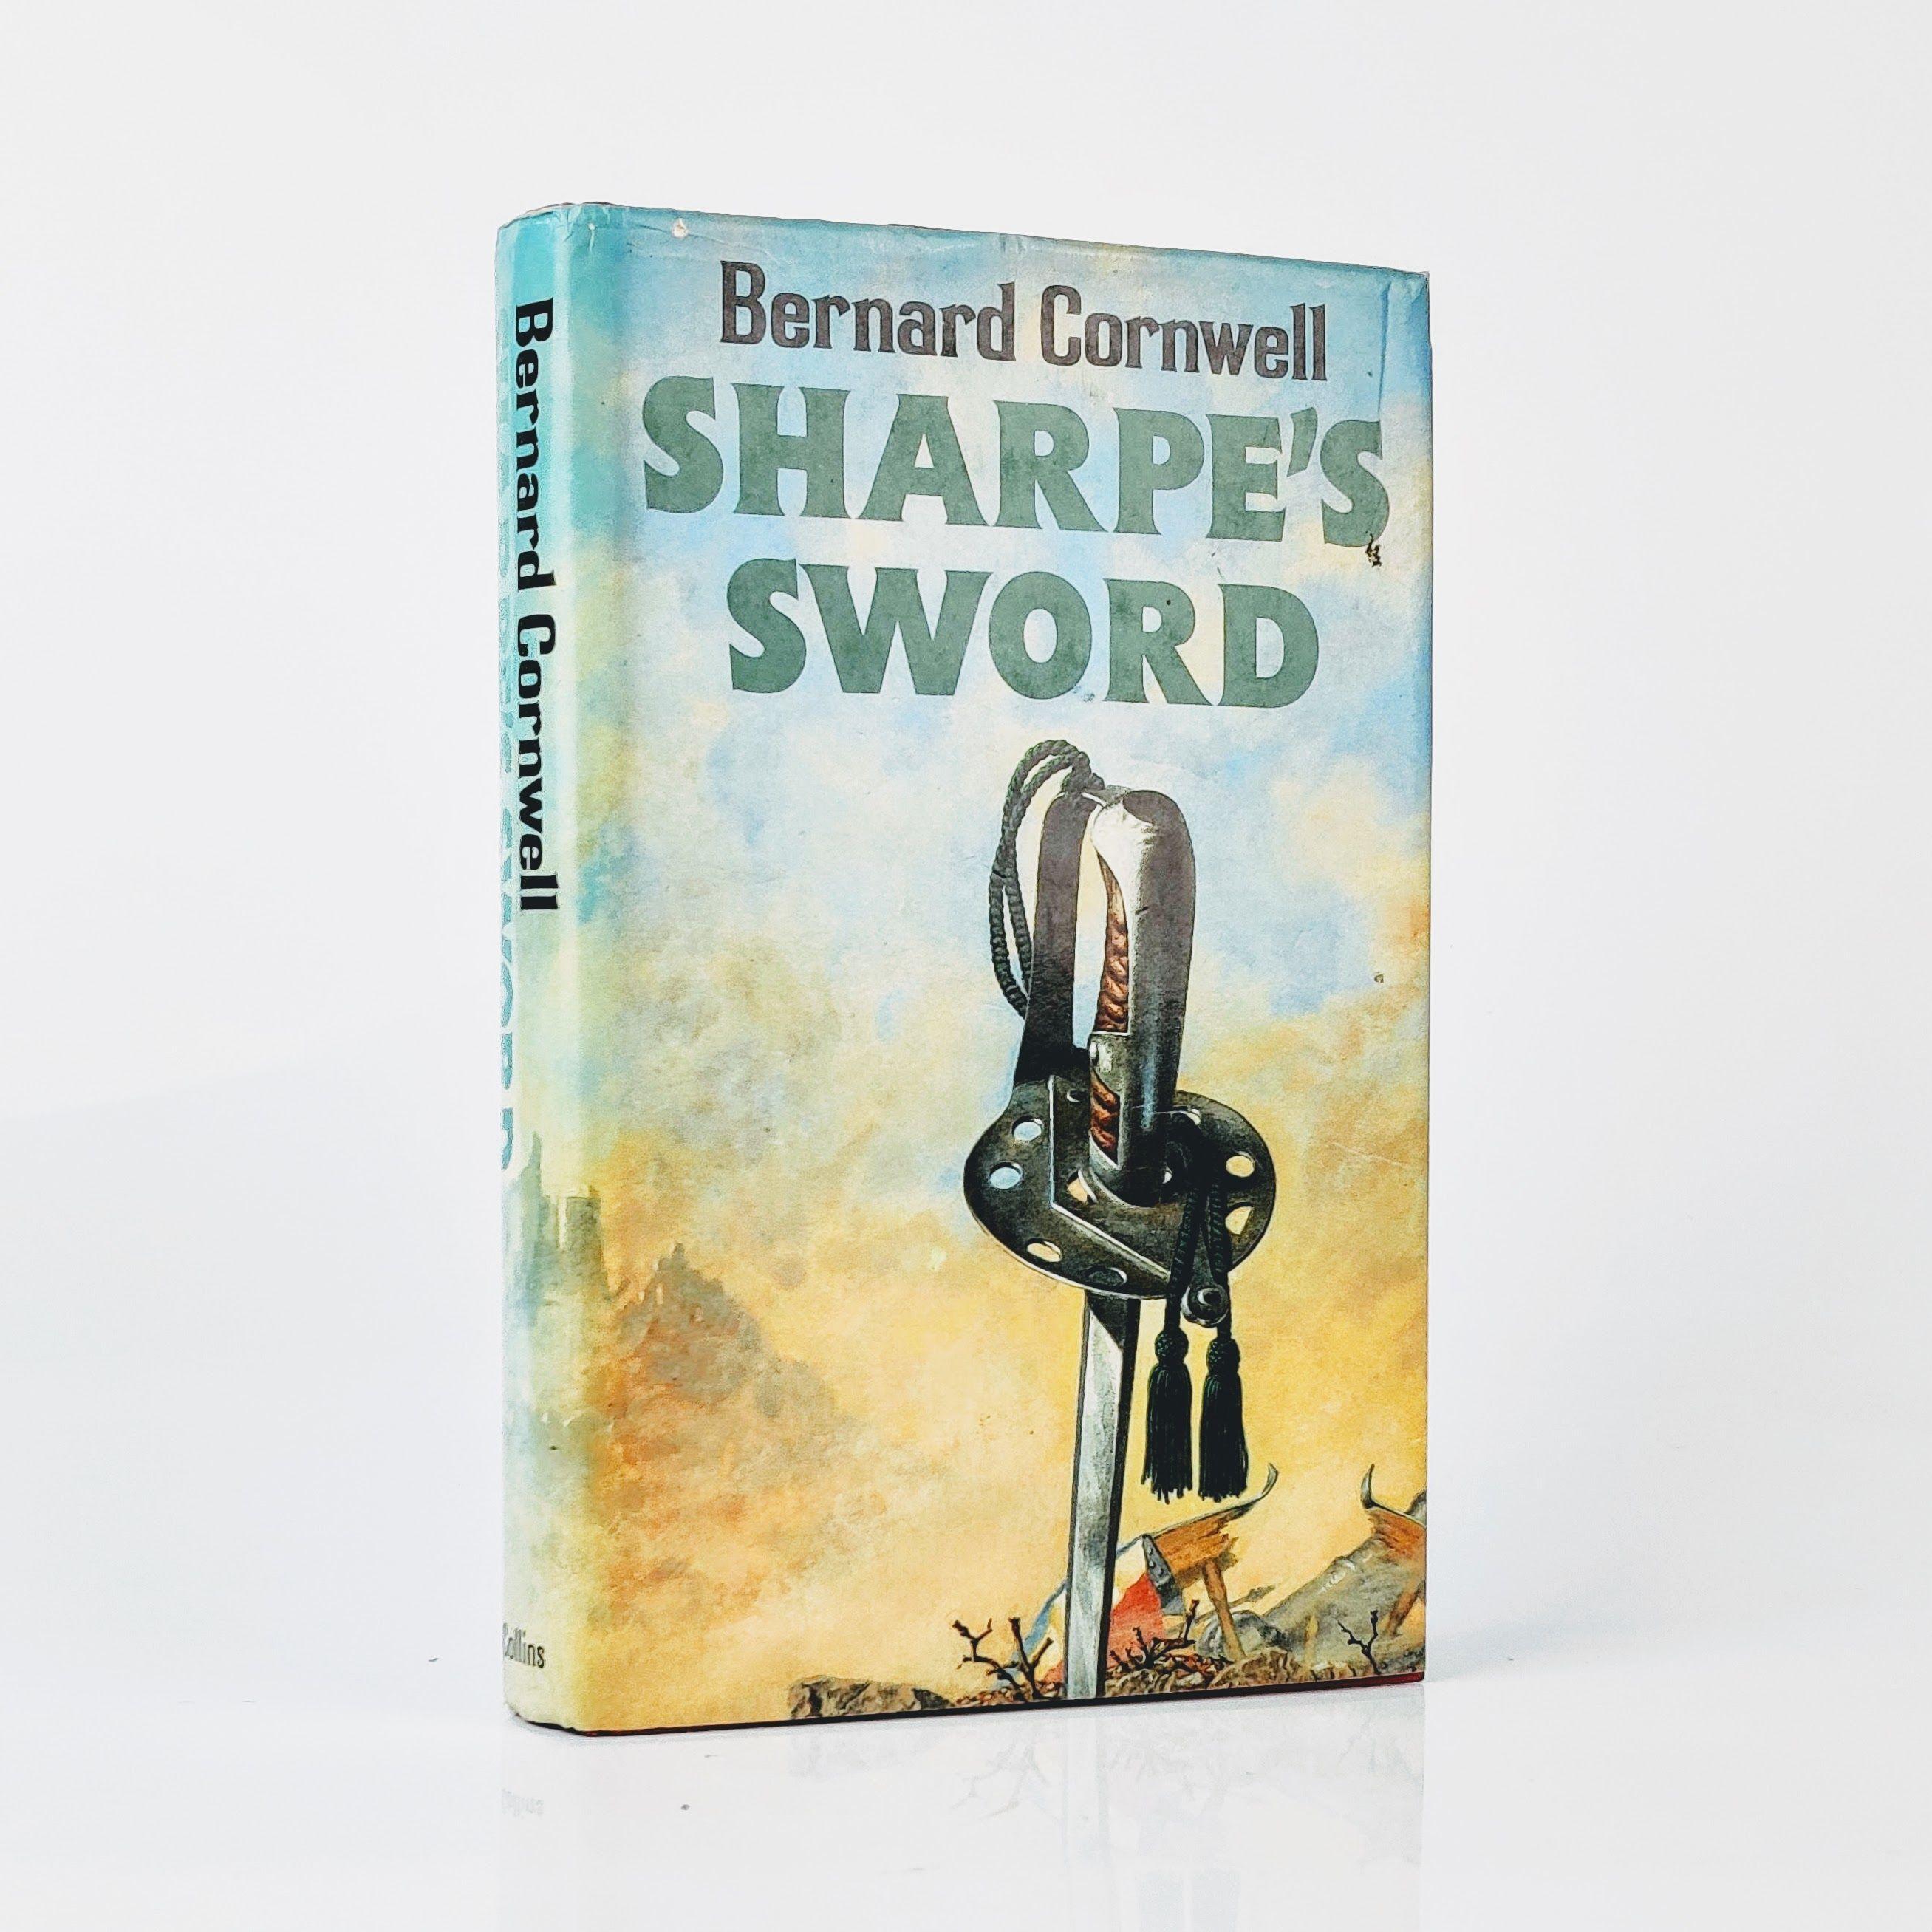 Sharpe's Sword (photo 1)